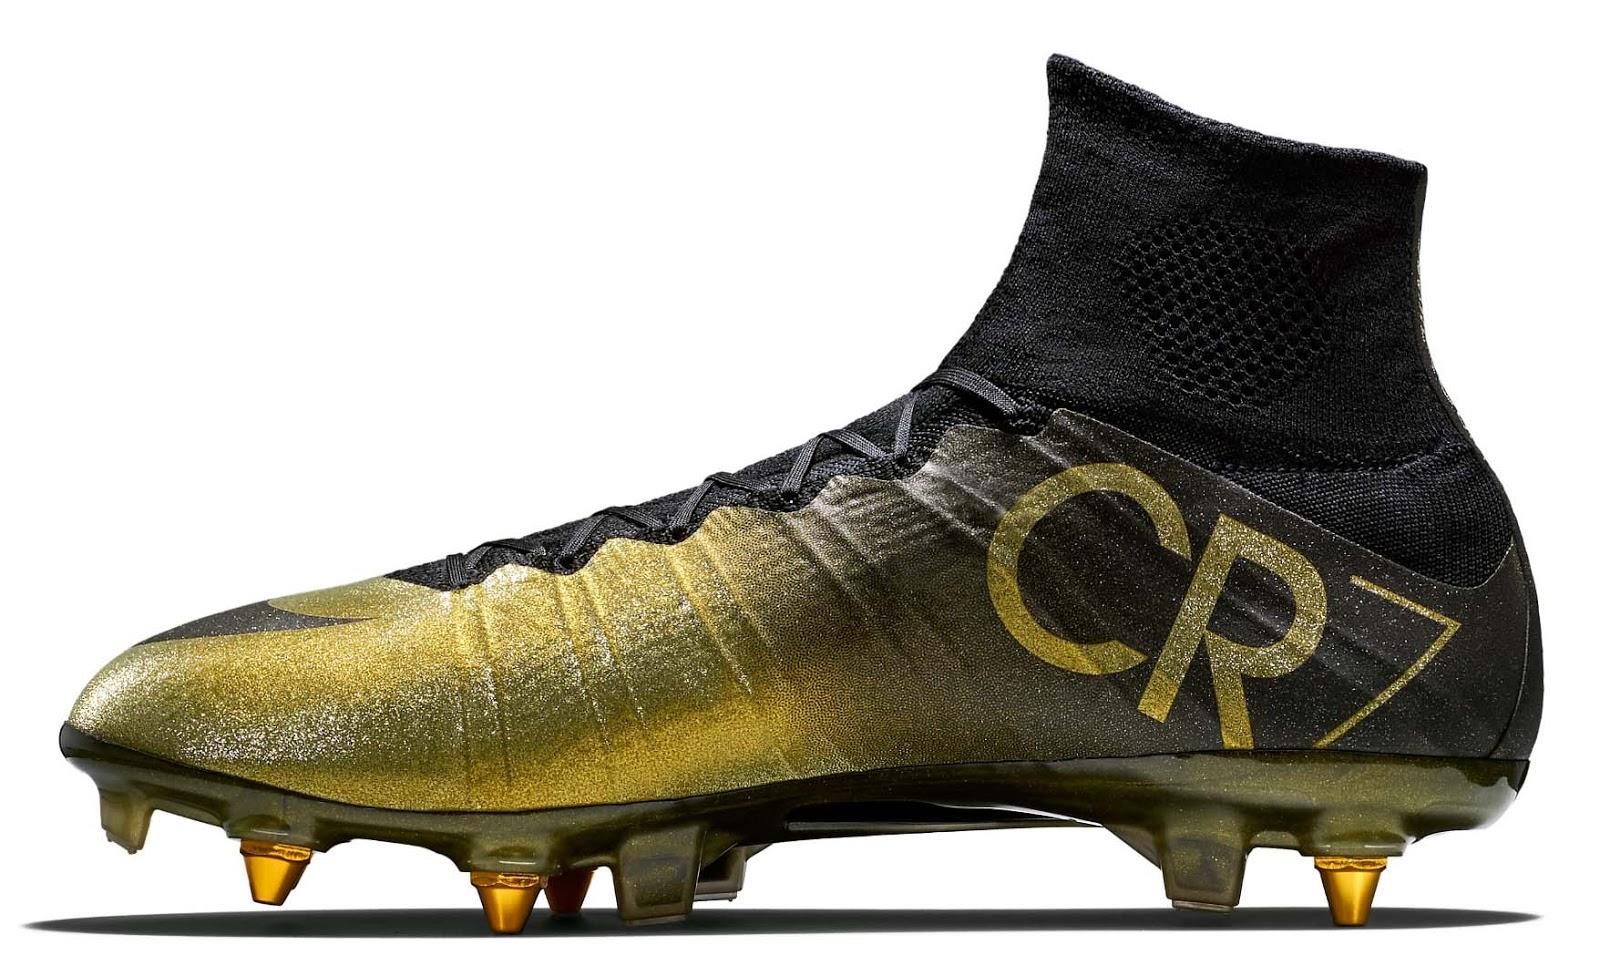 2014 - Cristiano Ronaldo - Nike Mercurial Superfly CR7 Rare Gold